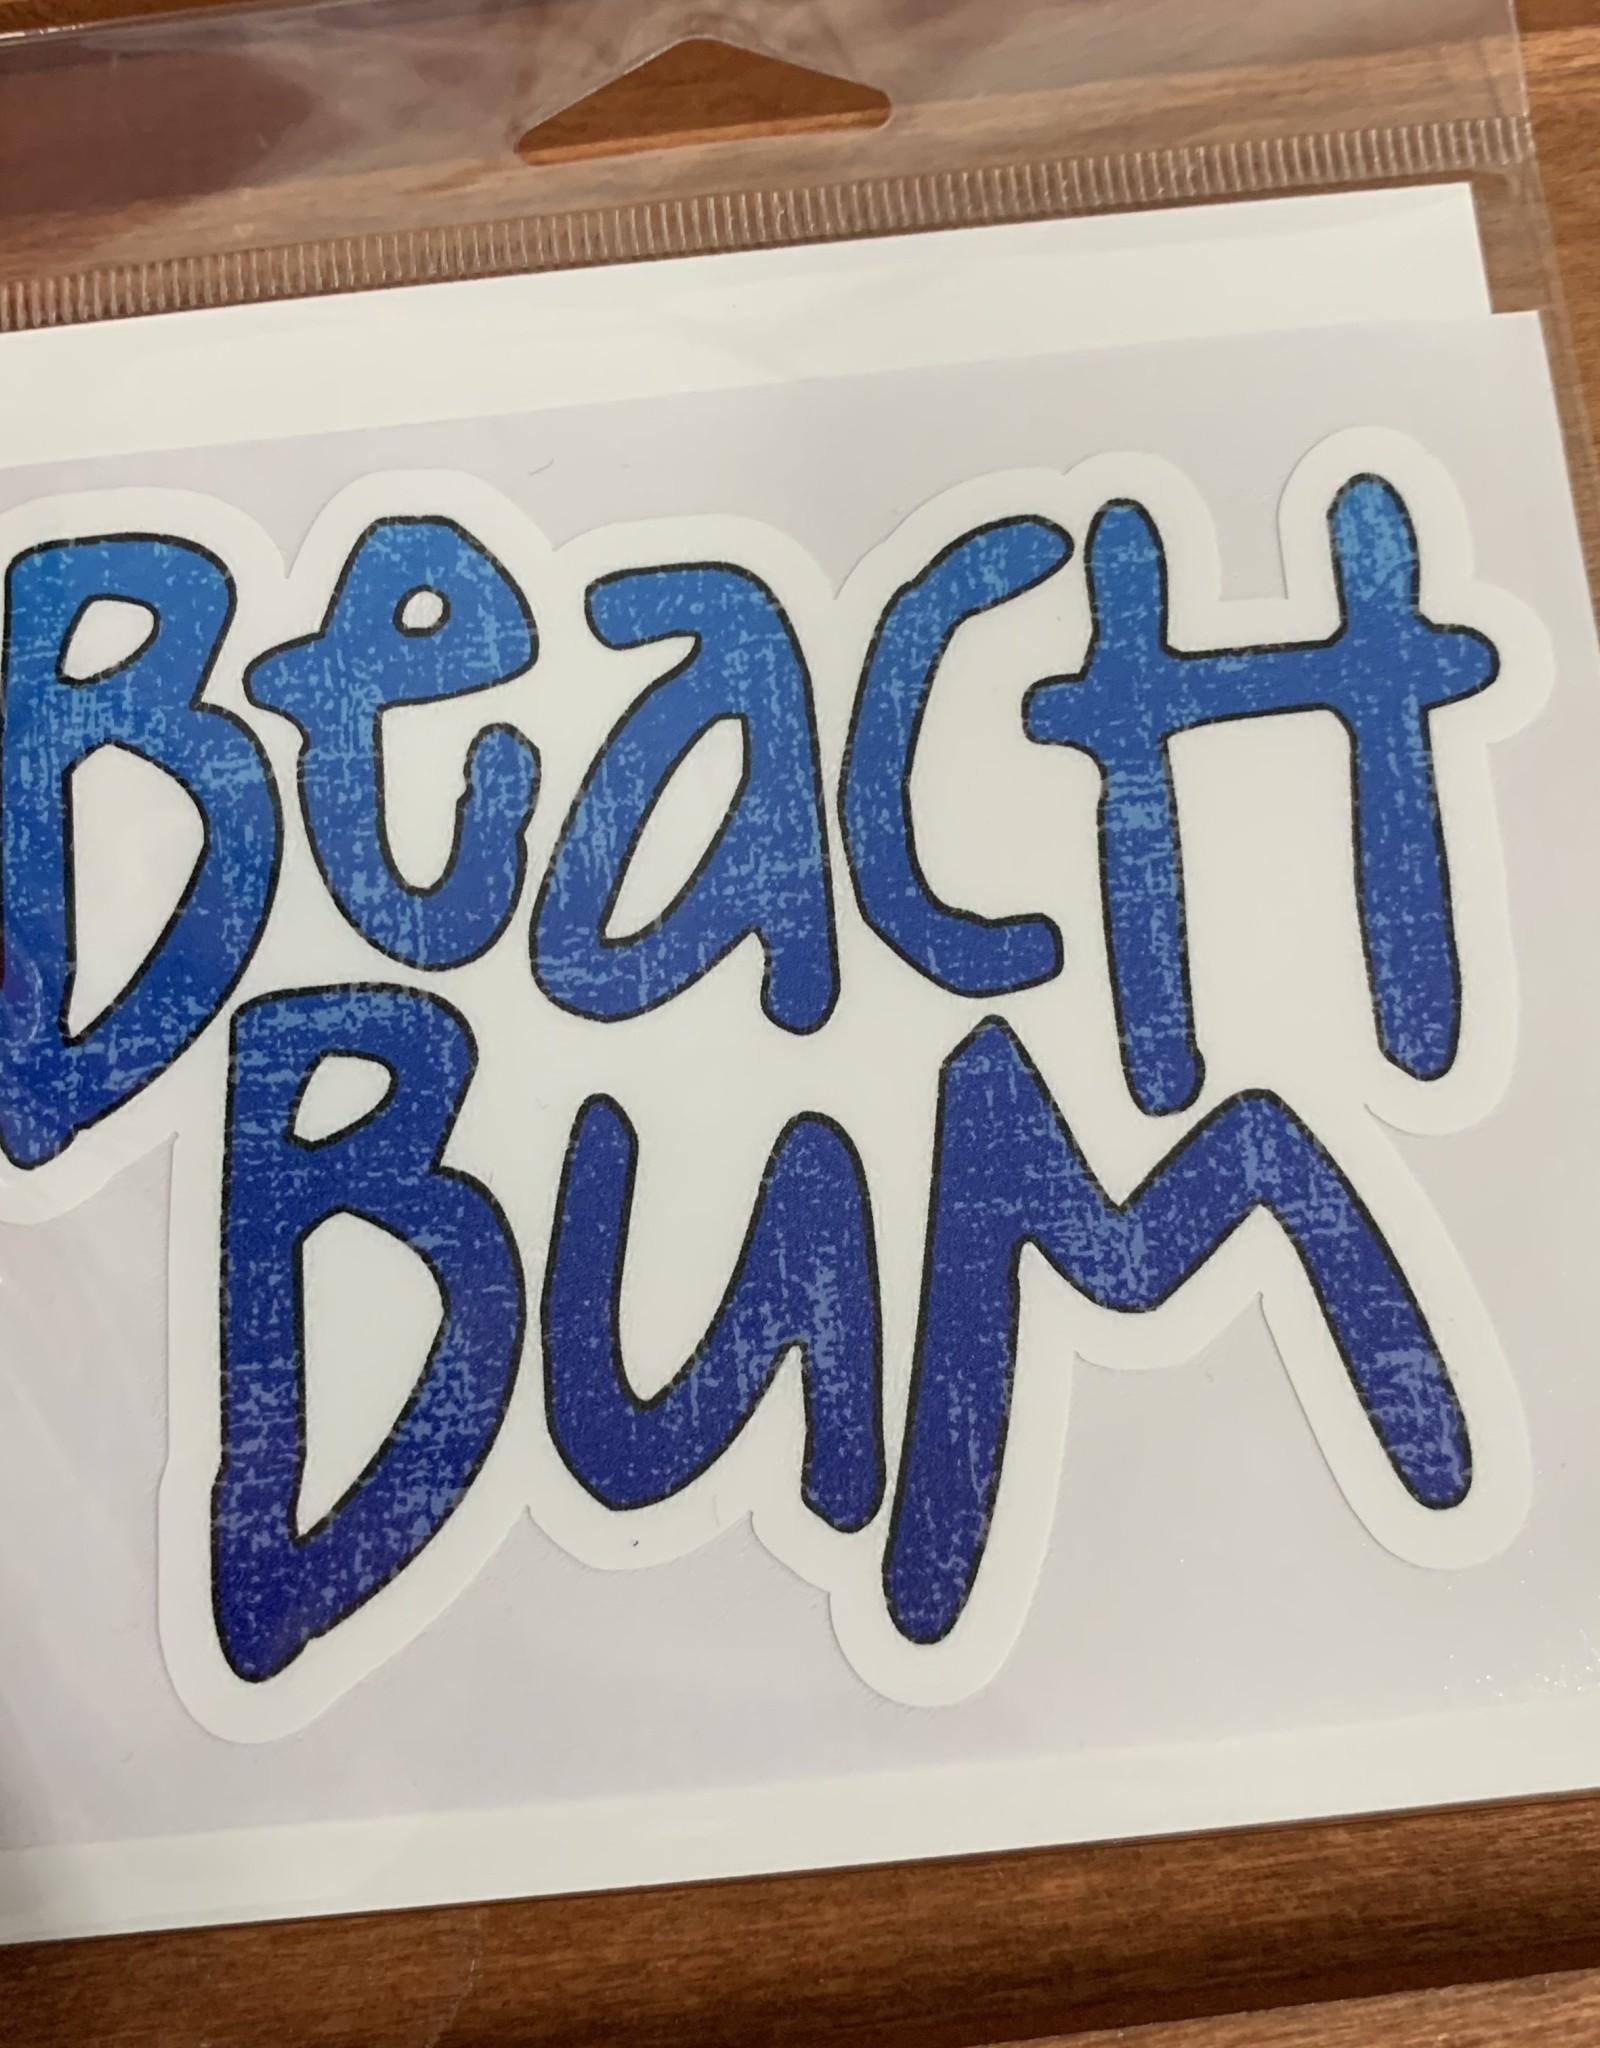 BEACH BUM STICKER (LARGE)